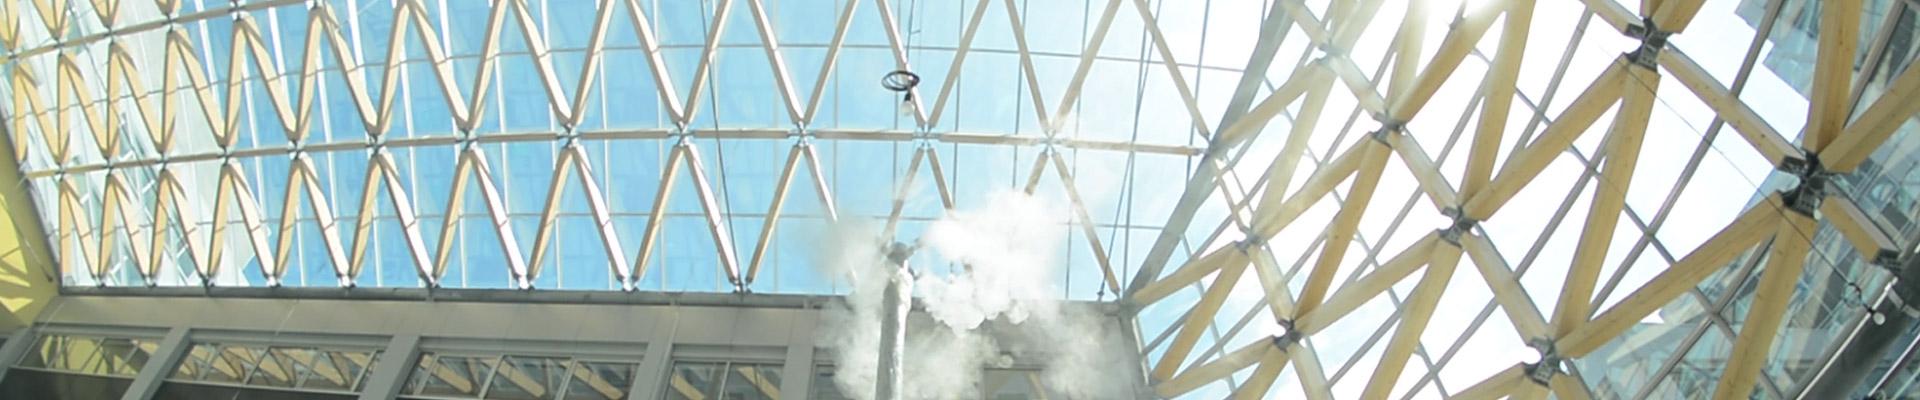 siron dry deluge testing header